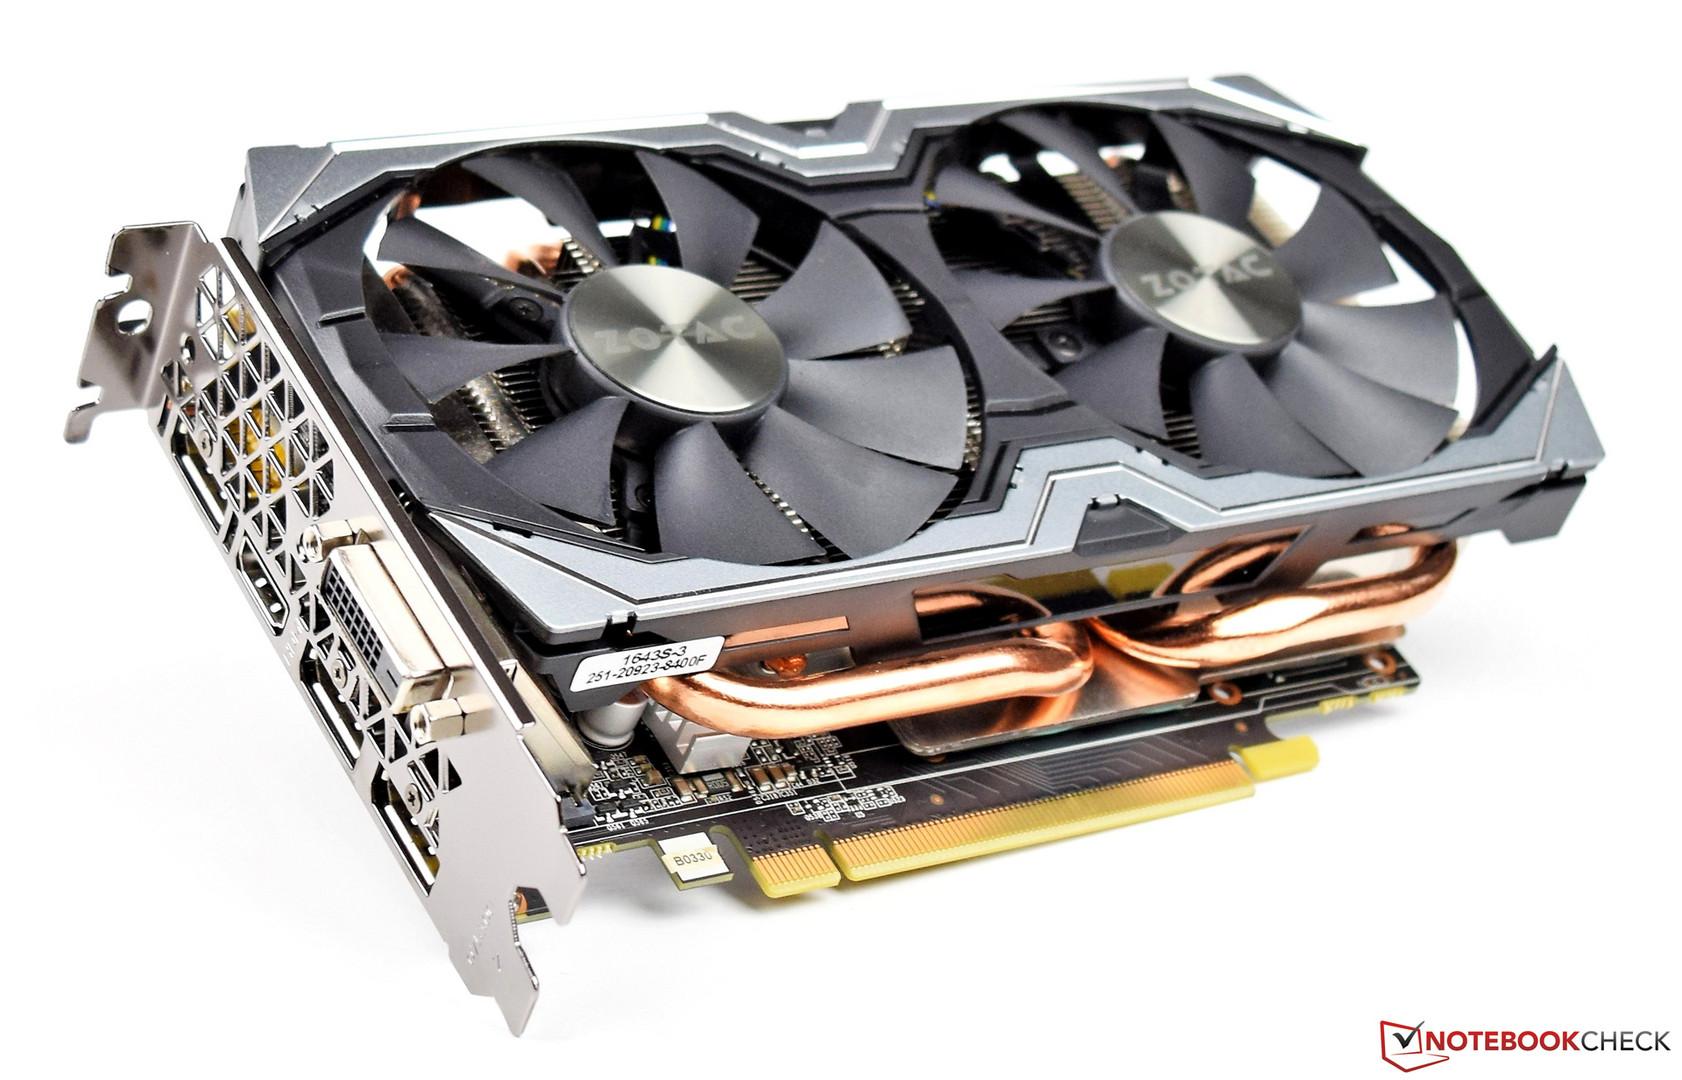 Zotac GeForce GTX 1070 Mini Graphics Card SLI Configuration